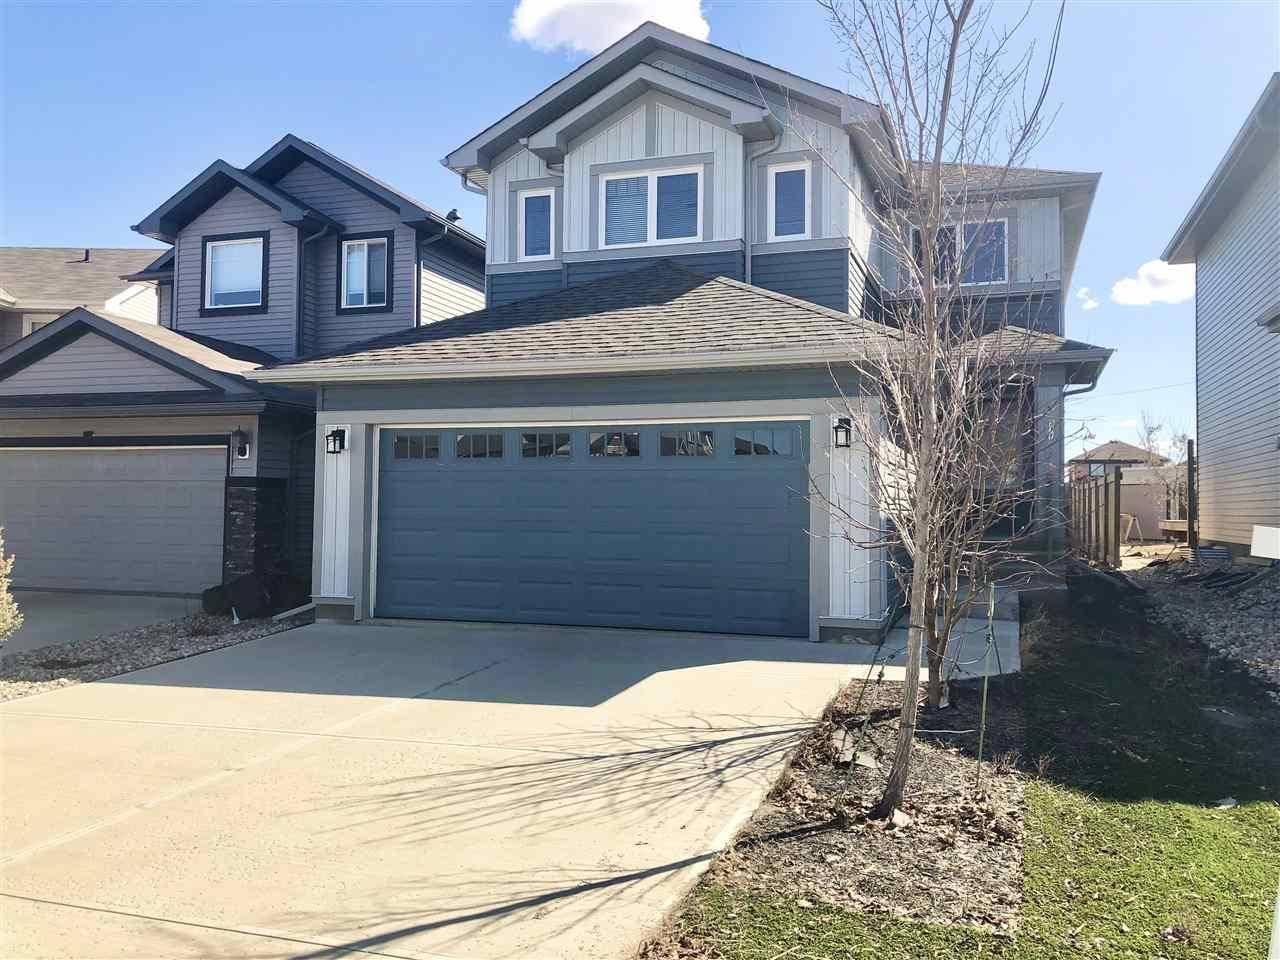 House for sale at 511 171 St Sw Edmonton Alberta - MLS: E4192012